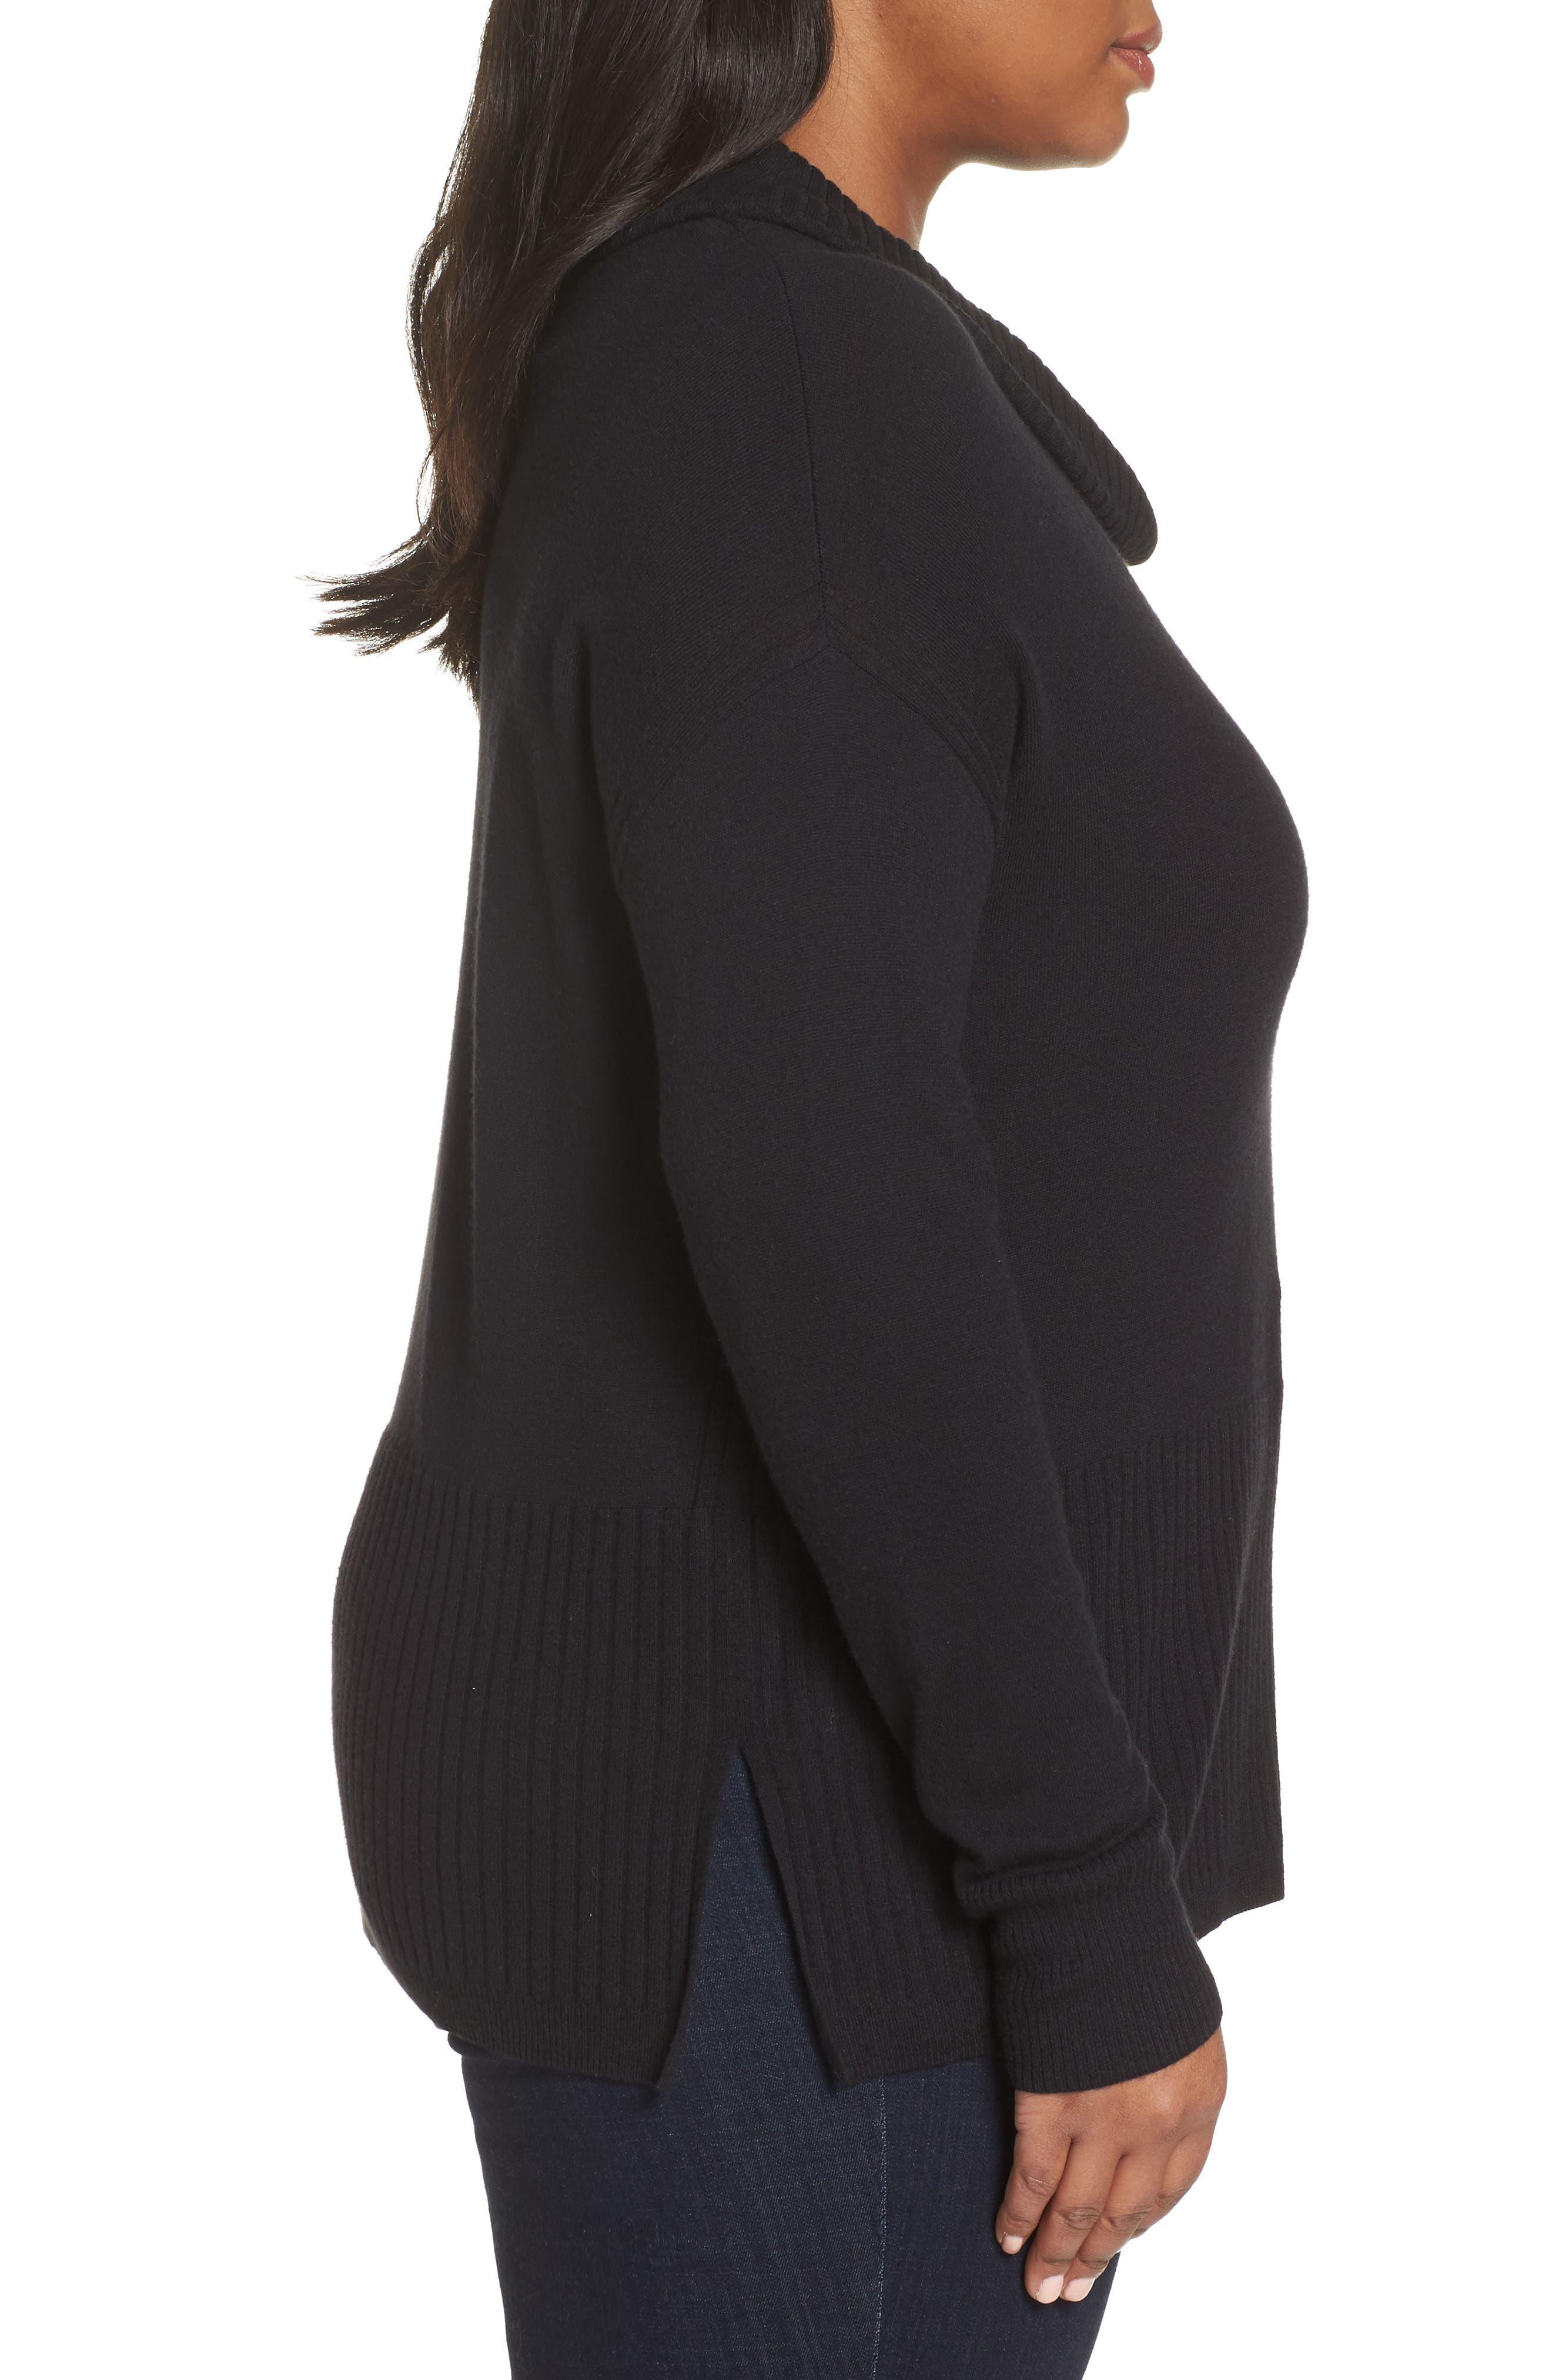 SEJOUR,                             Cowl Neck Pullover,                             Alternate thumbnail 3, color,                             BLACK